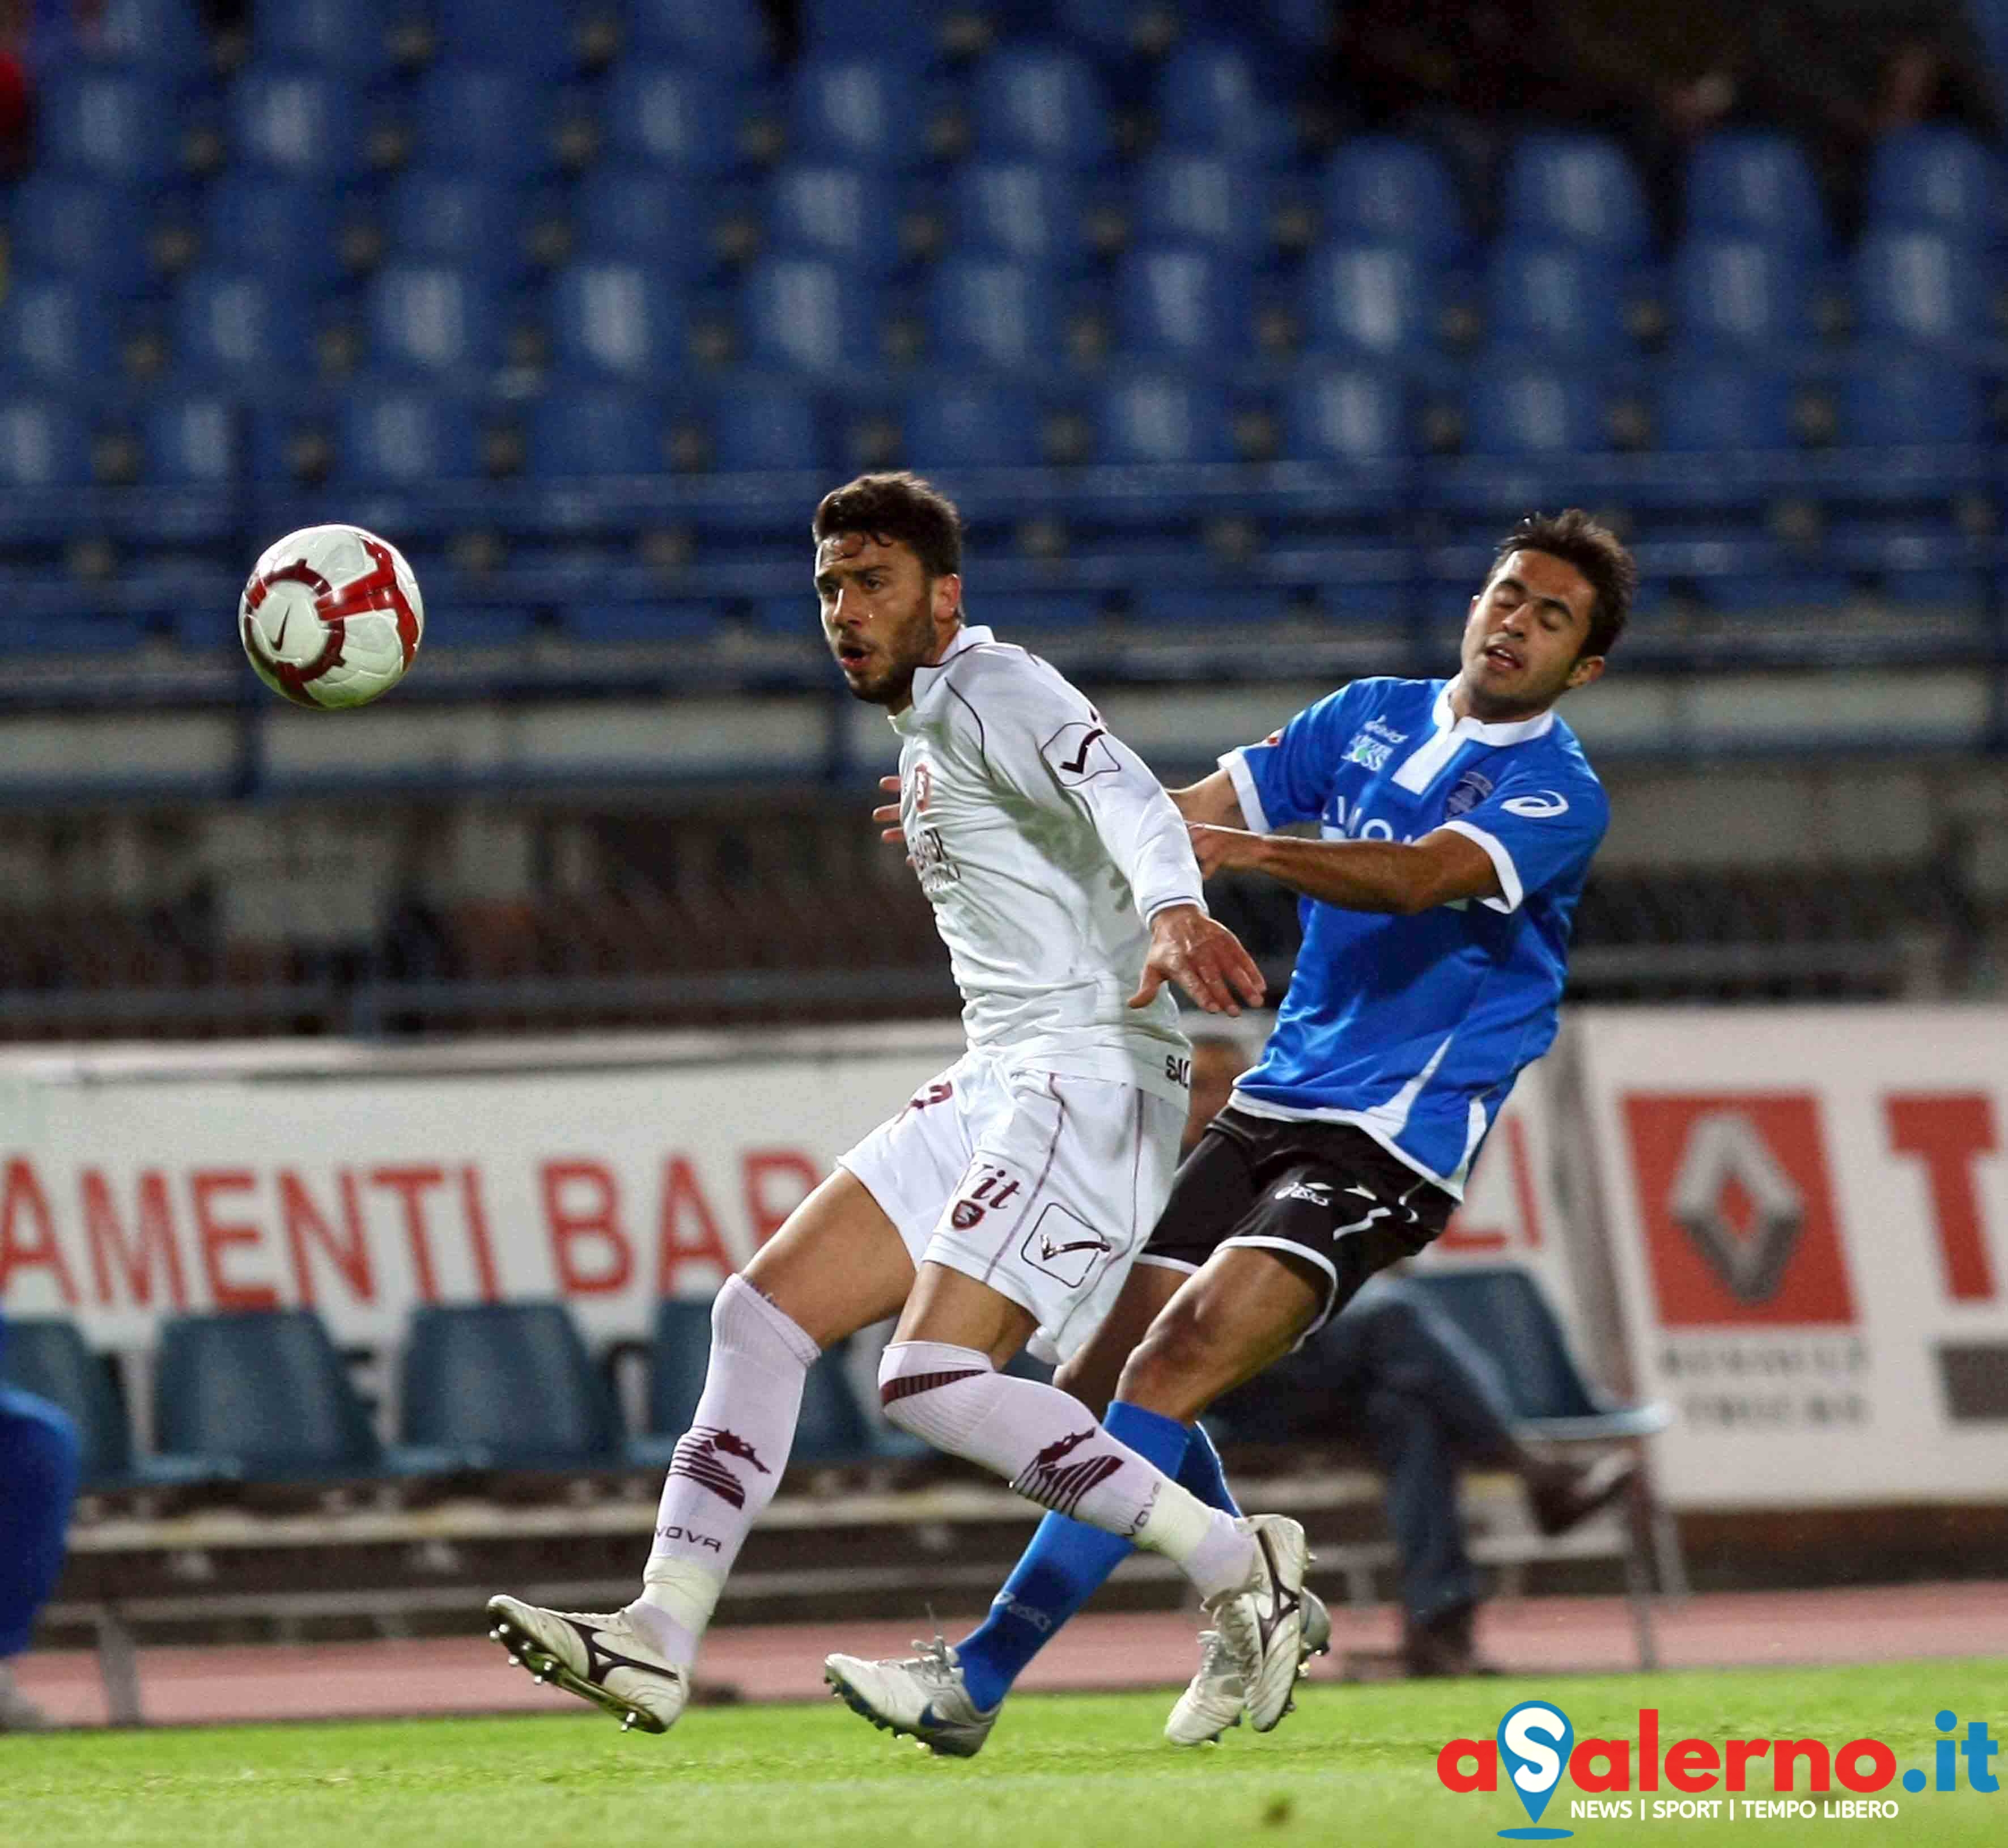 Sal : Empoli-Salernitana Campionato Serie B 2009/2010 nella foto Foto tanopress